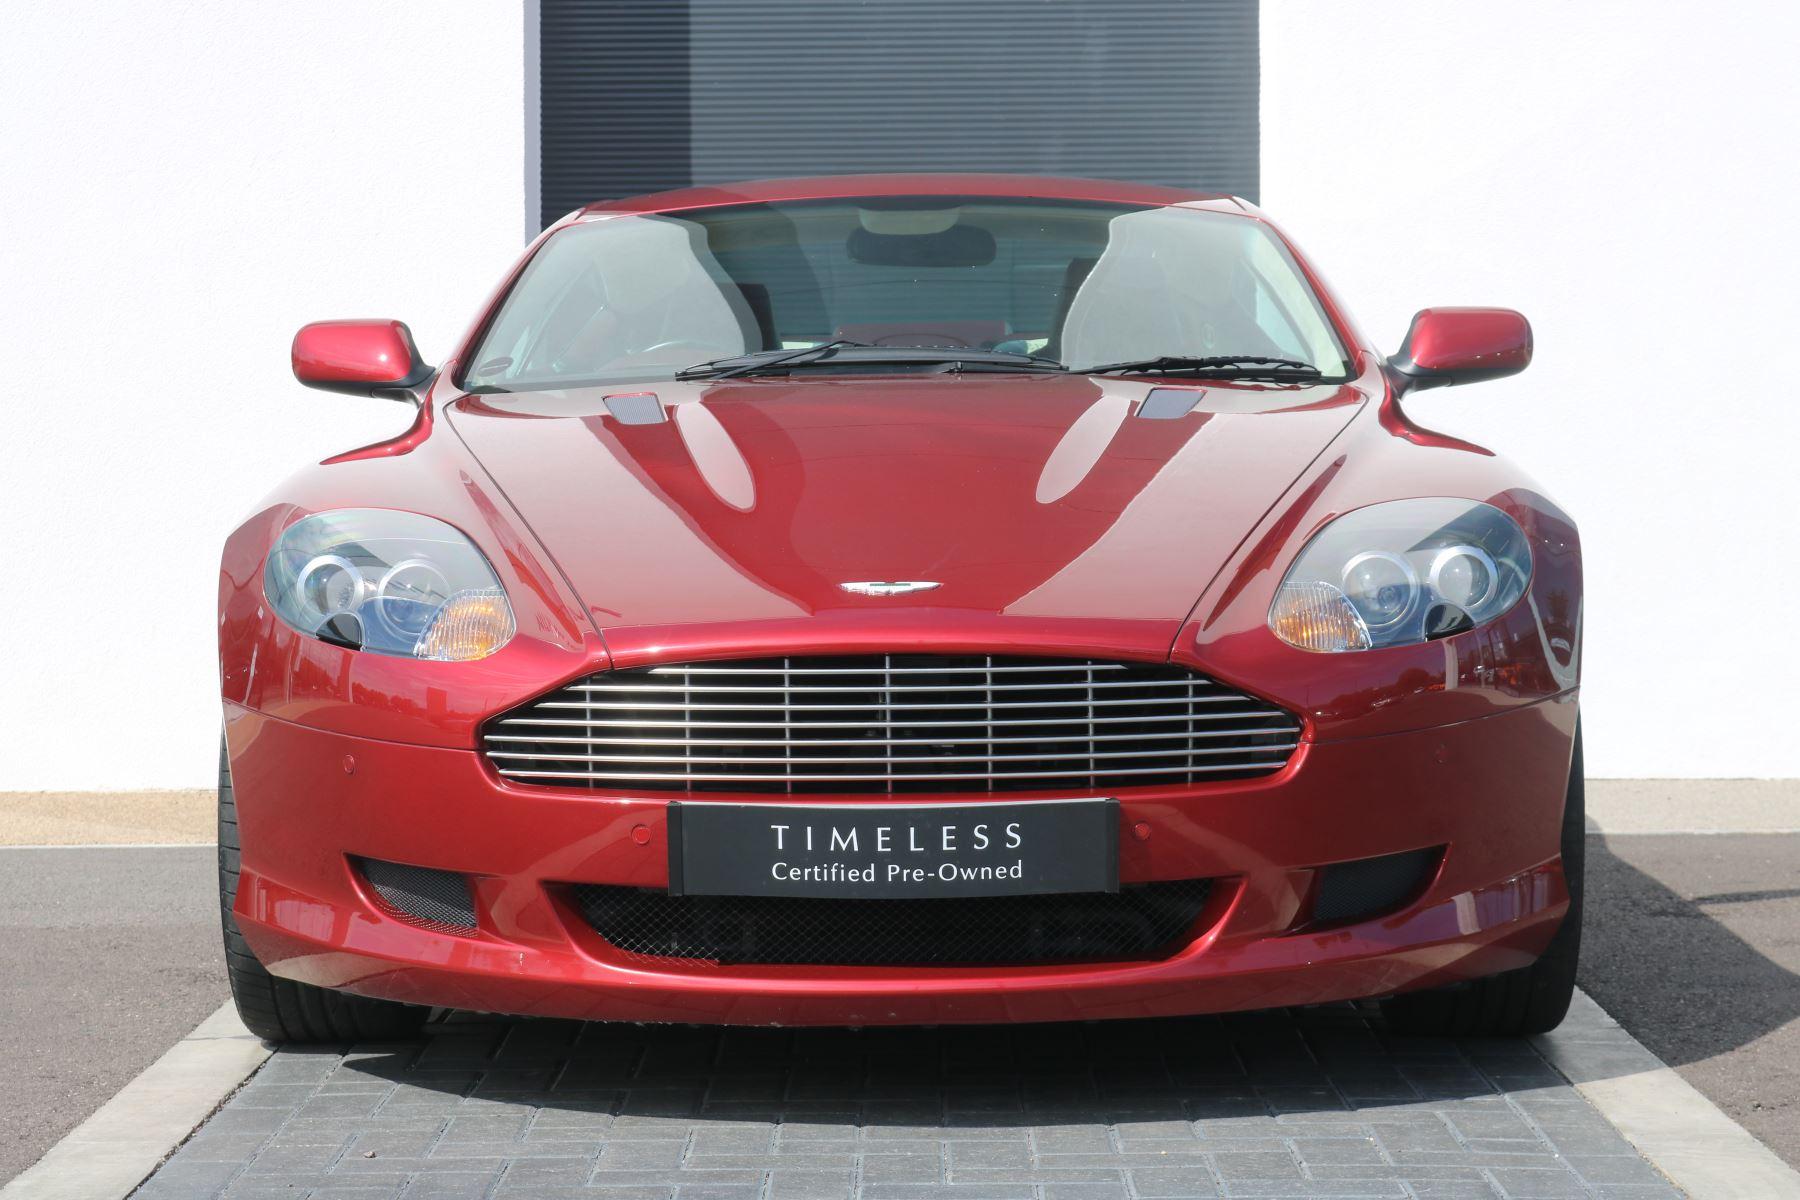 Used Aston Martin Db9 Cars For Sale Grange